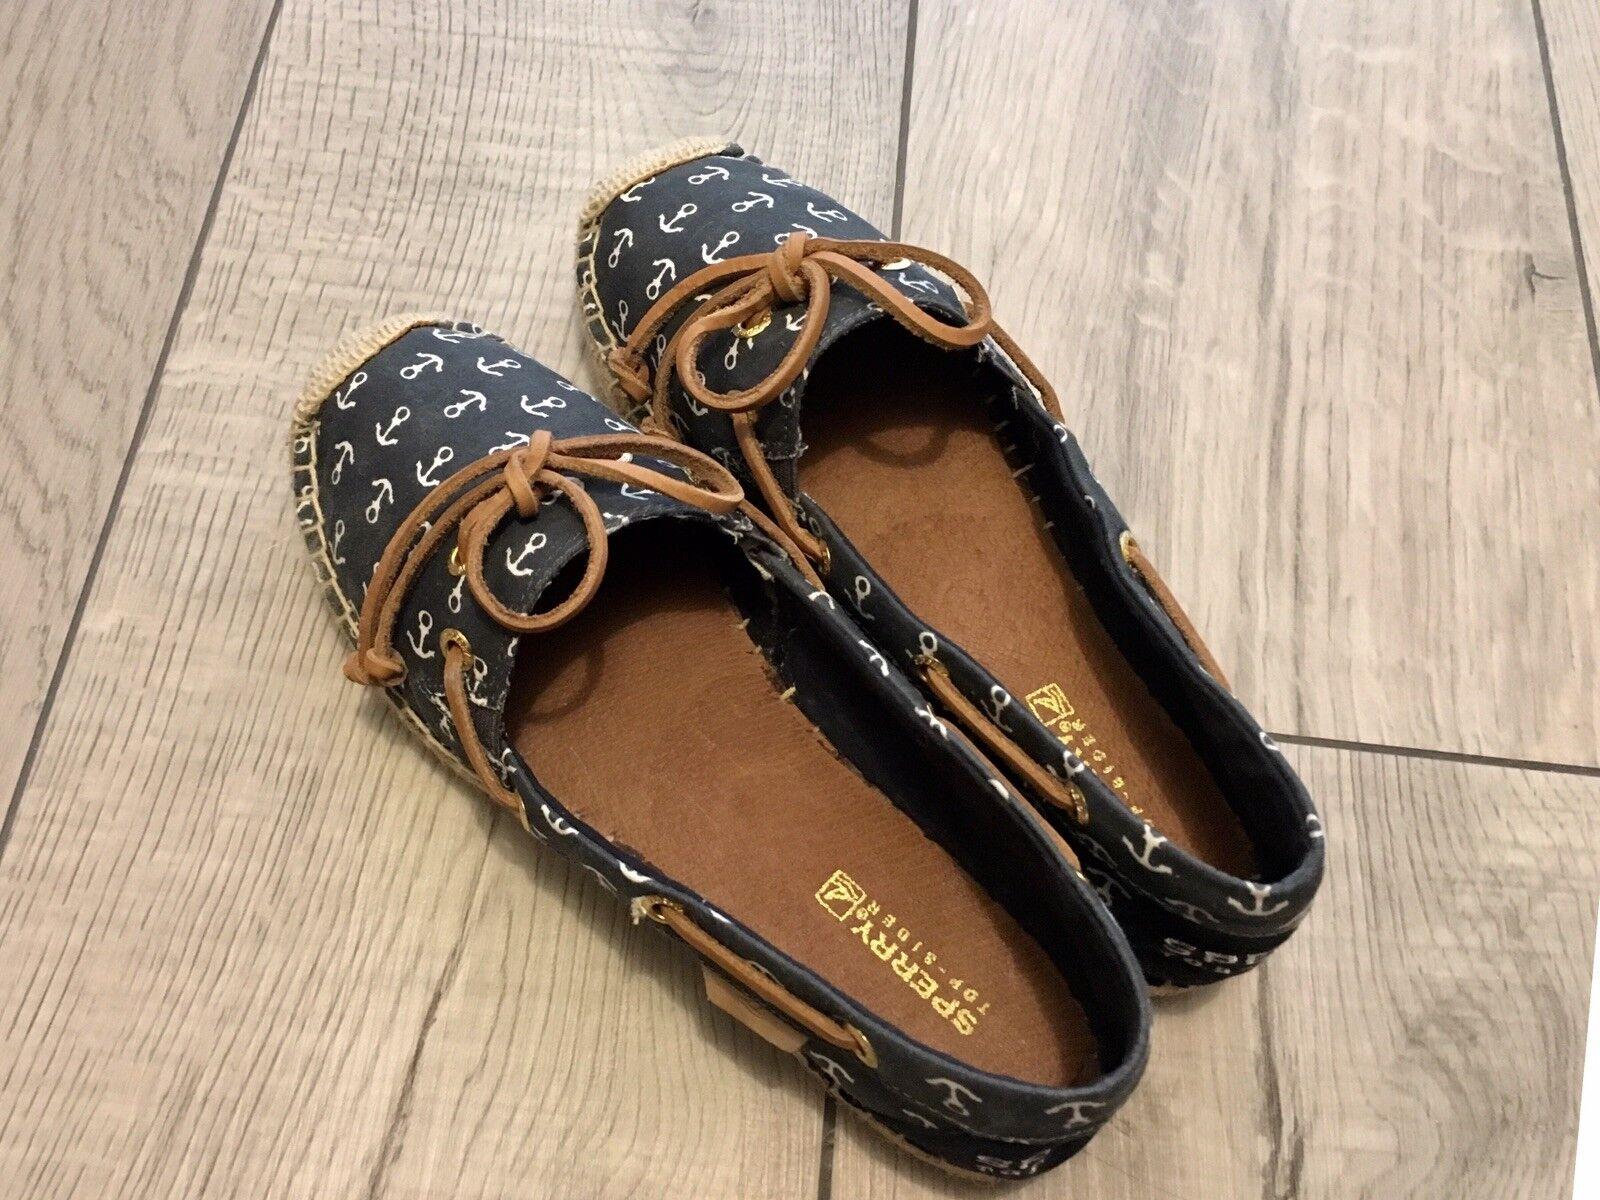 SPERRY Top-Sider Women's Katama Espadrilles Sz 5 Slip-on Canvas shoes Anchor